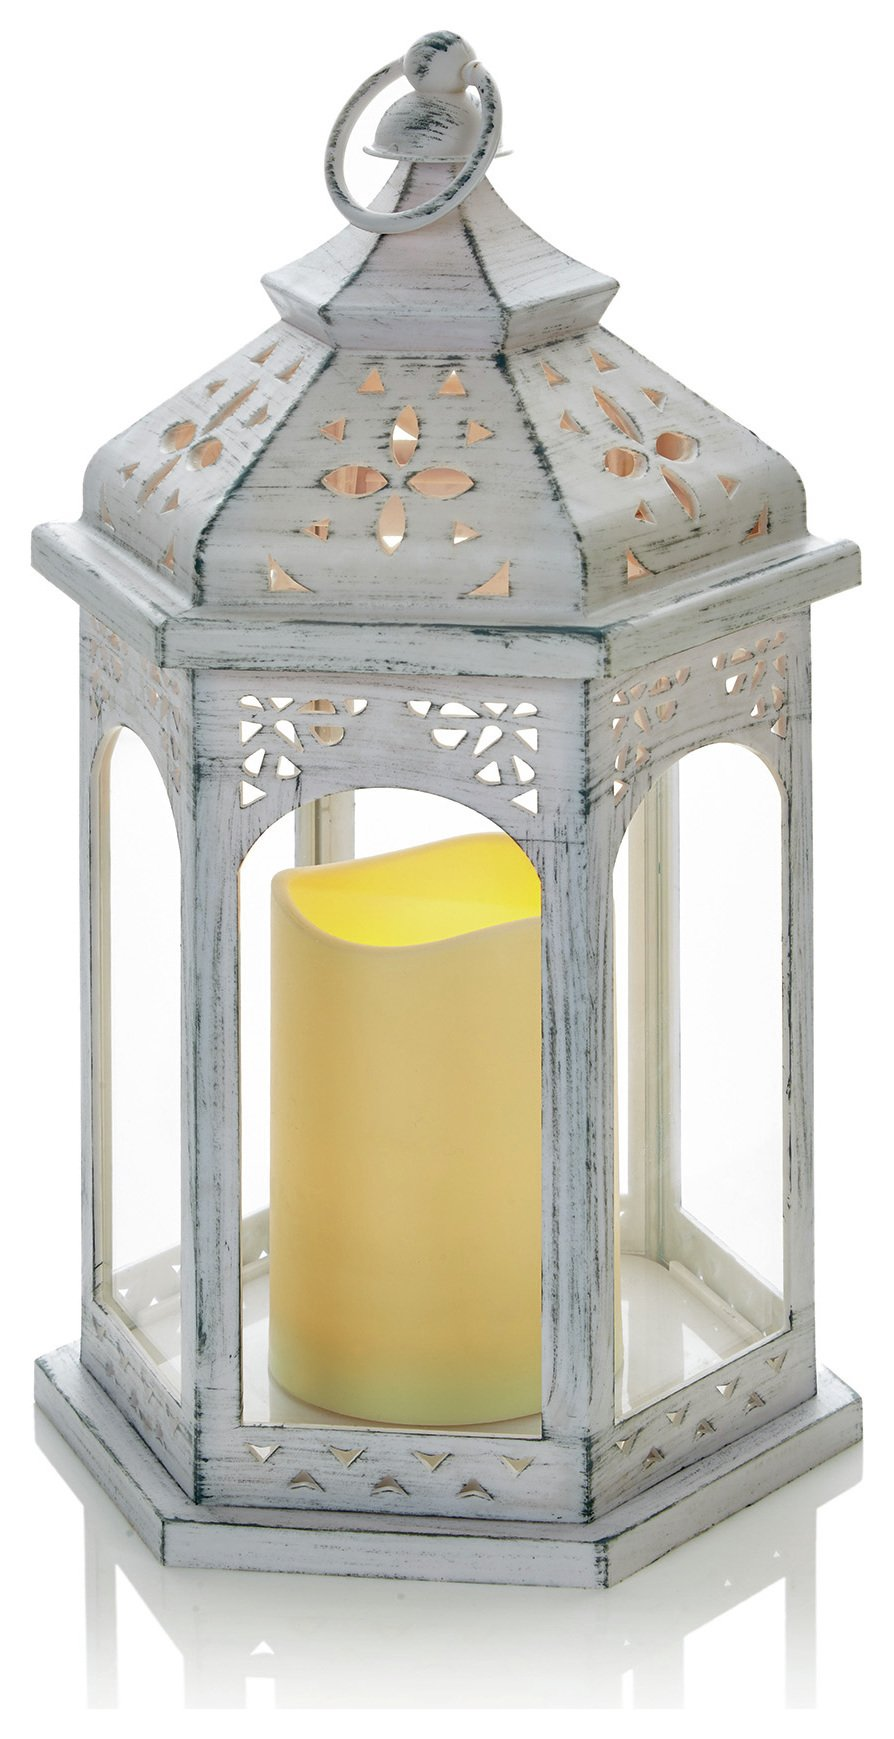 premier decorations led candle lantern white. Black Bedroom Furniture Sets. Home Design Ideas